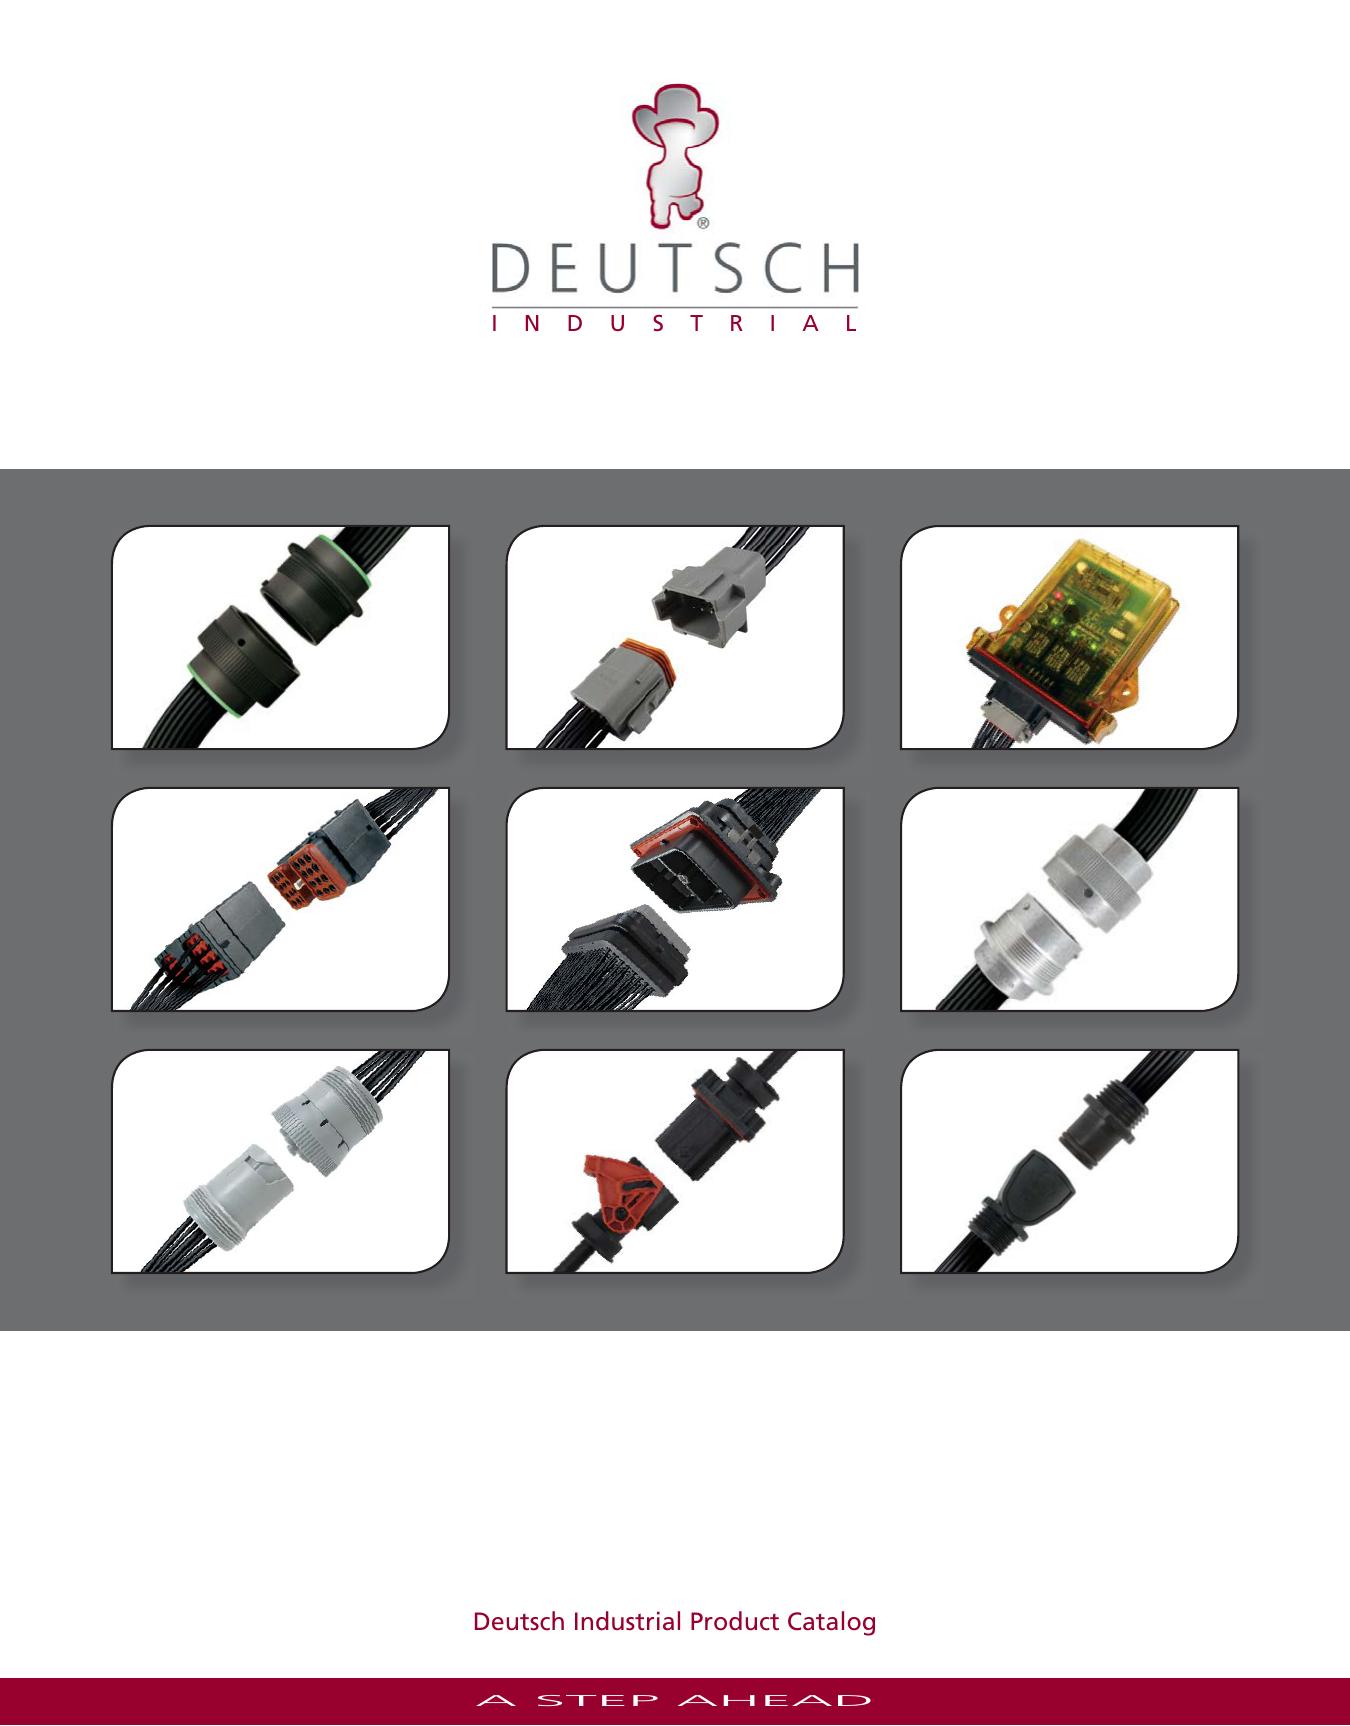 Deutsch DT connector plug kit 225 peices Solid terminal pins Suit 16-20AWG